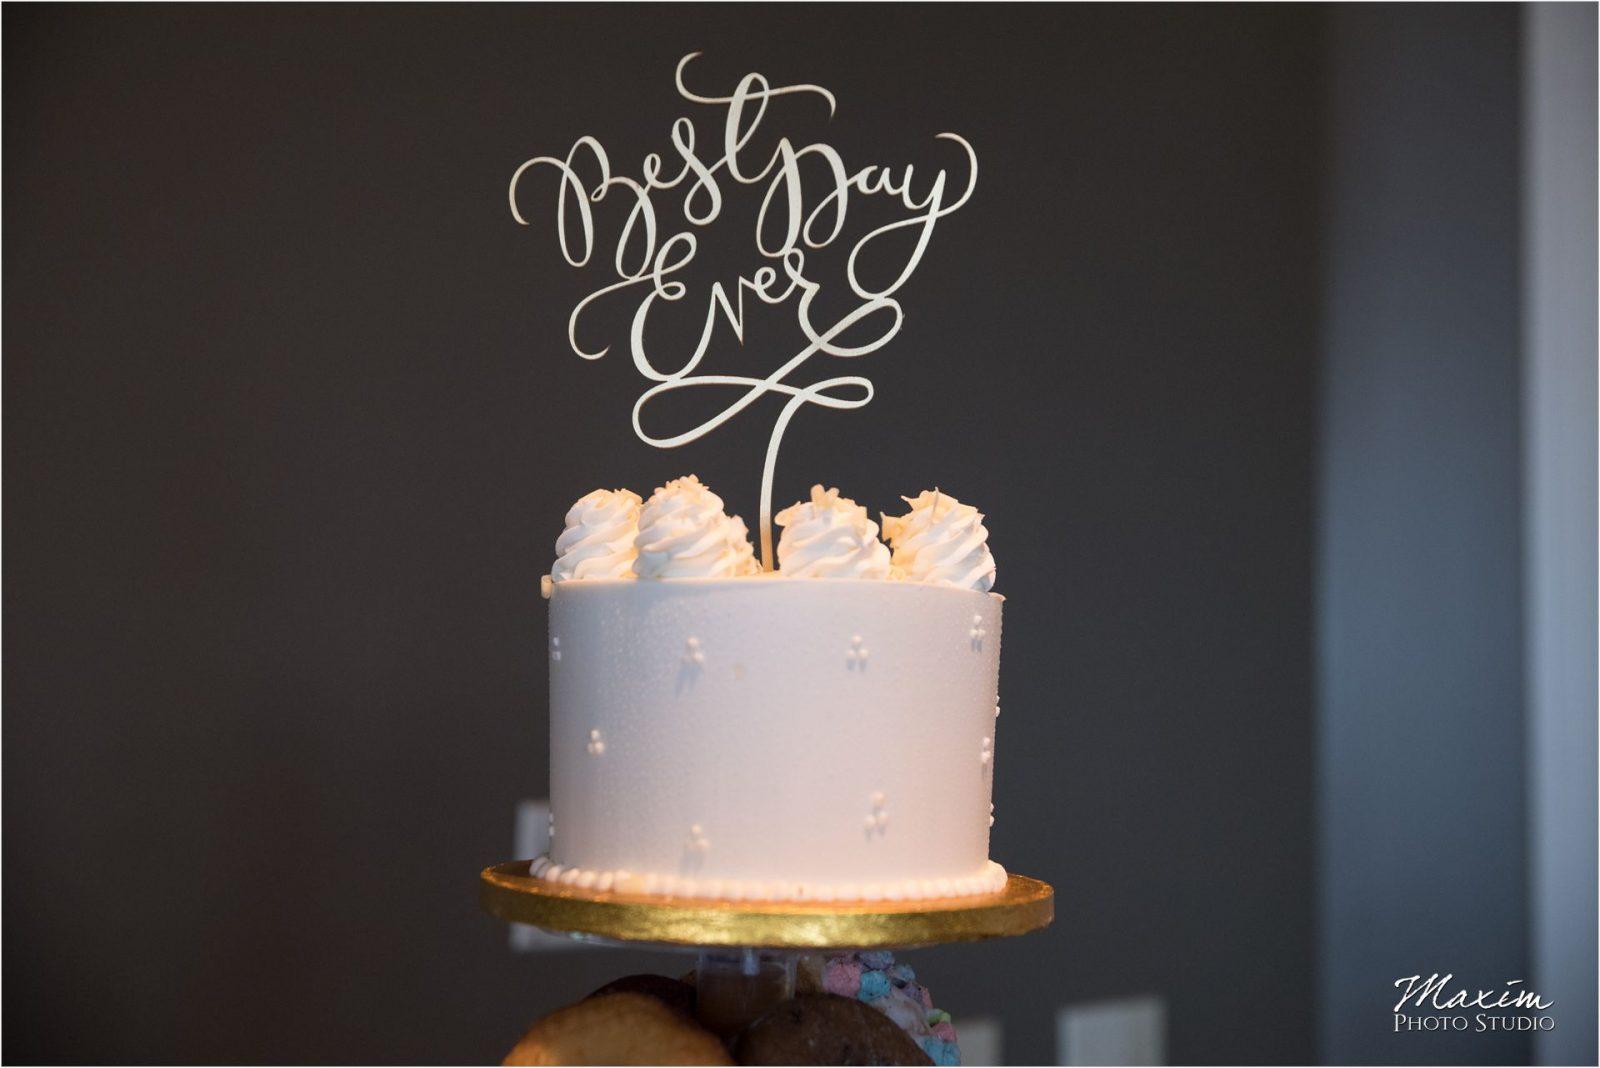 A Spoon Fulla Sugar Drees Pavilion Wedding Cake